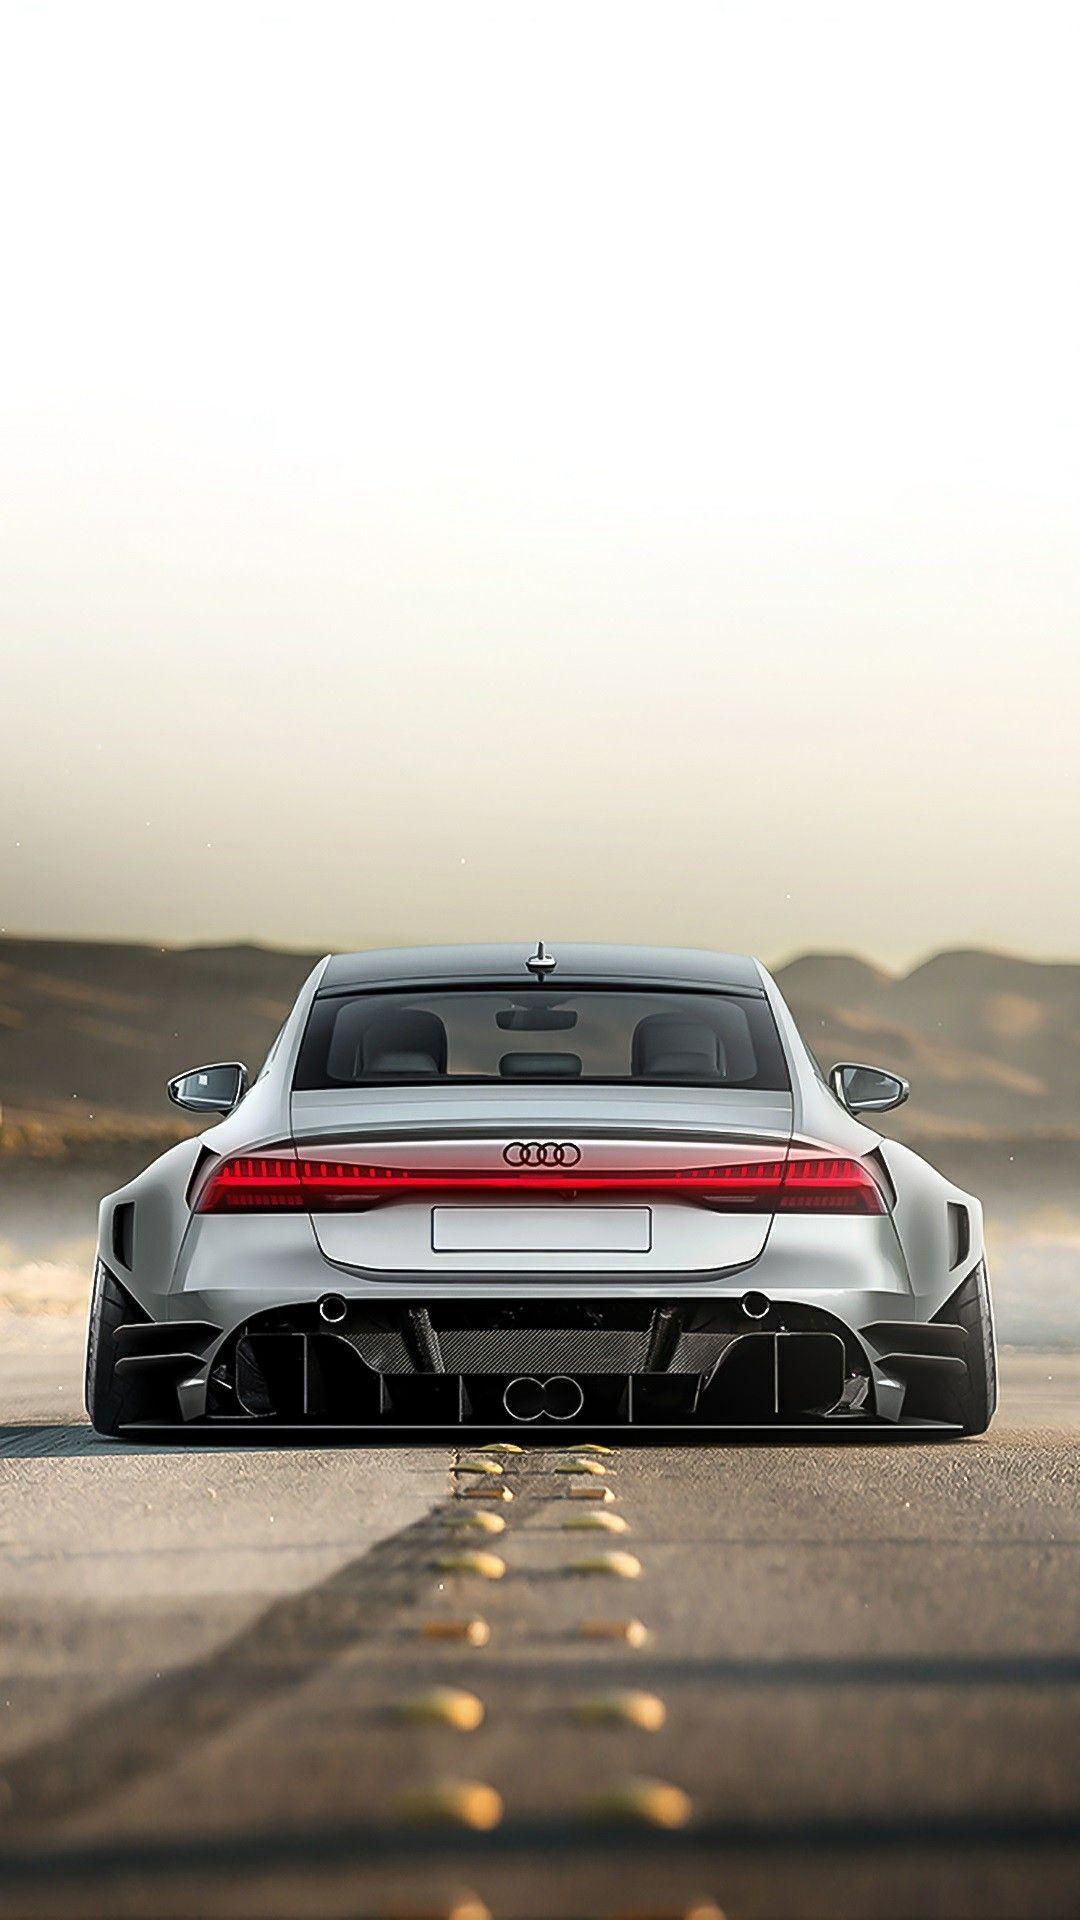 Amazing Cool Ideas Custom Car Wheels Rat Rods Car Wheels Wallpaper